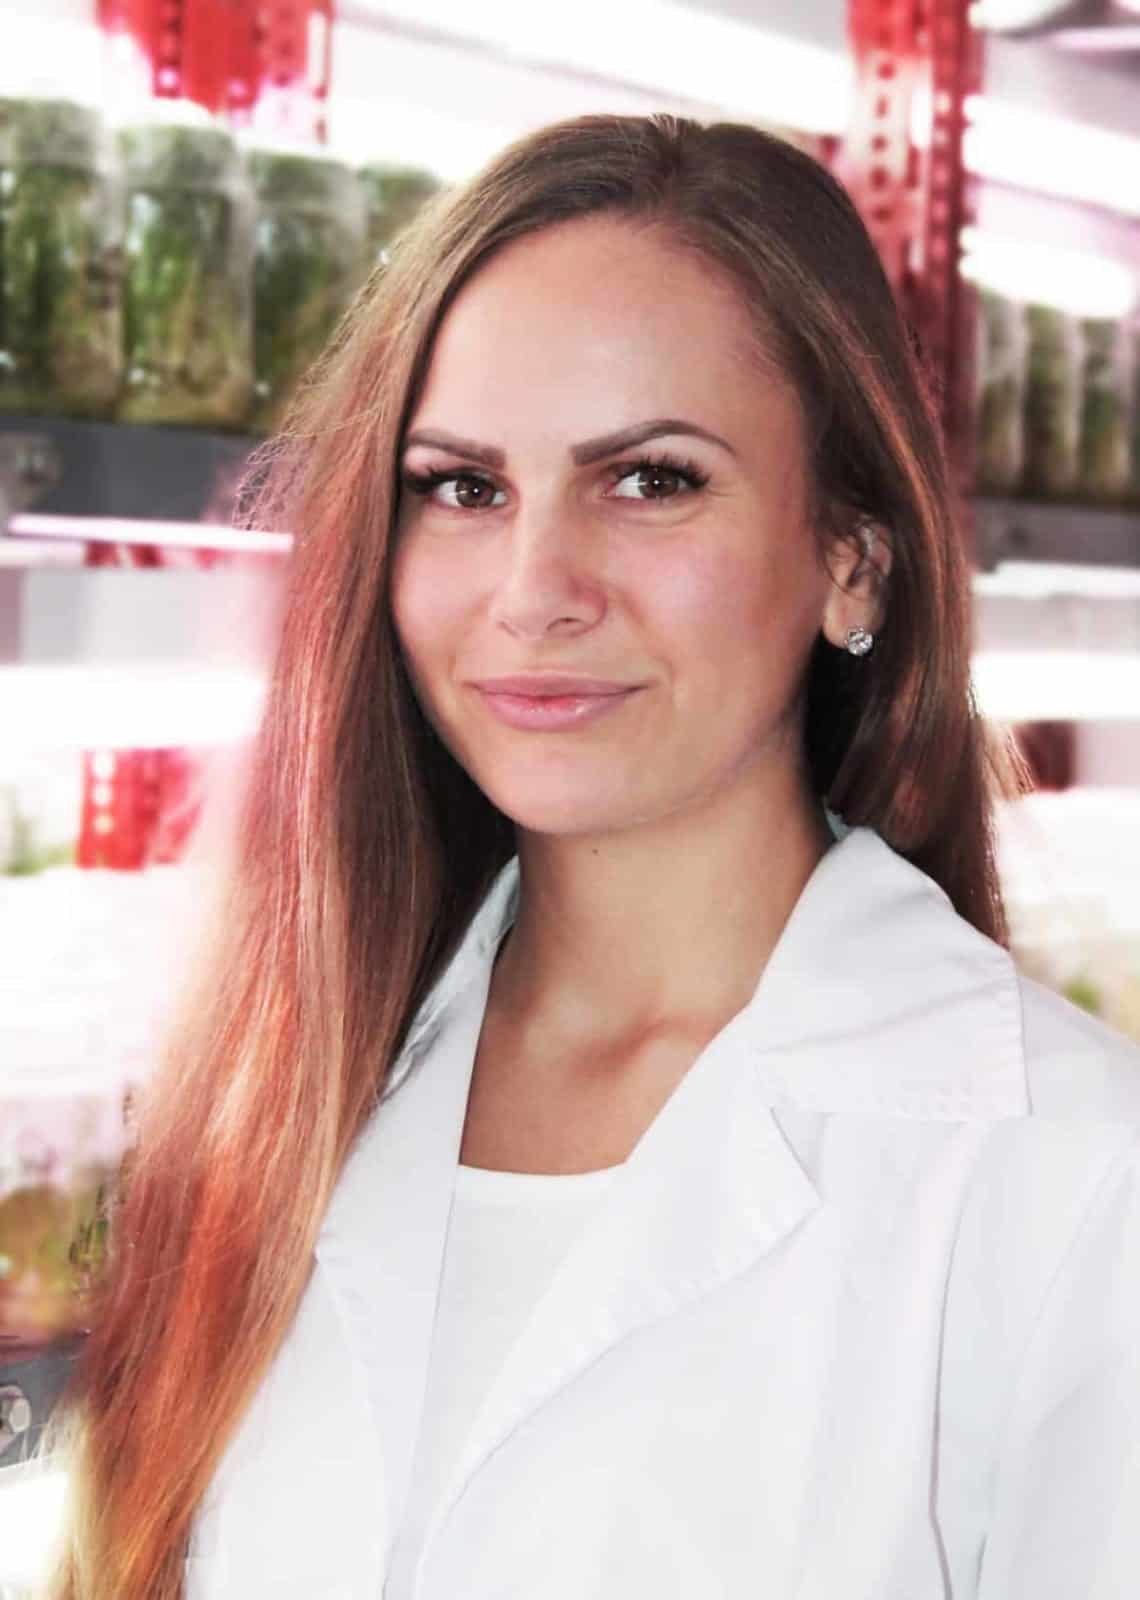 Melinda Toth-Szabo